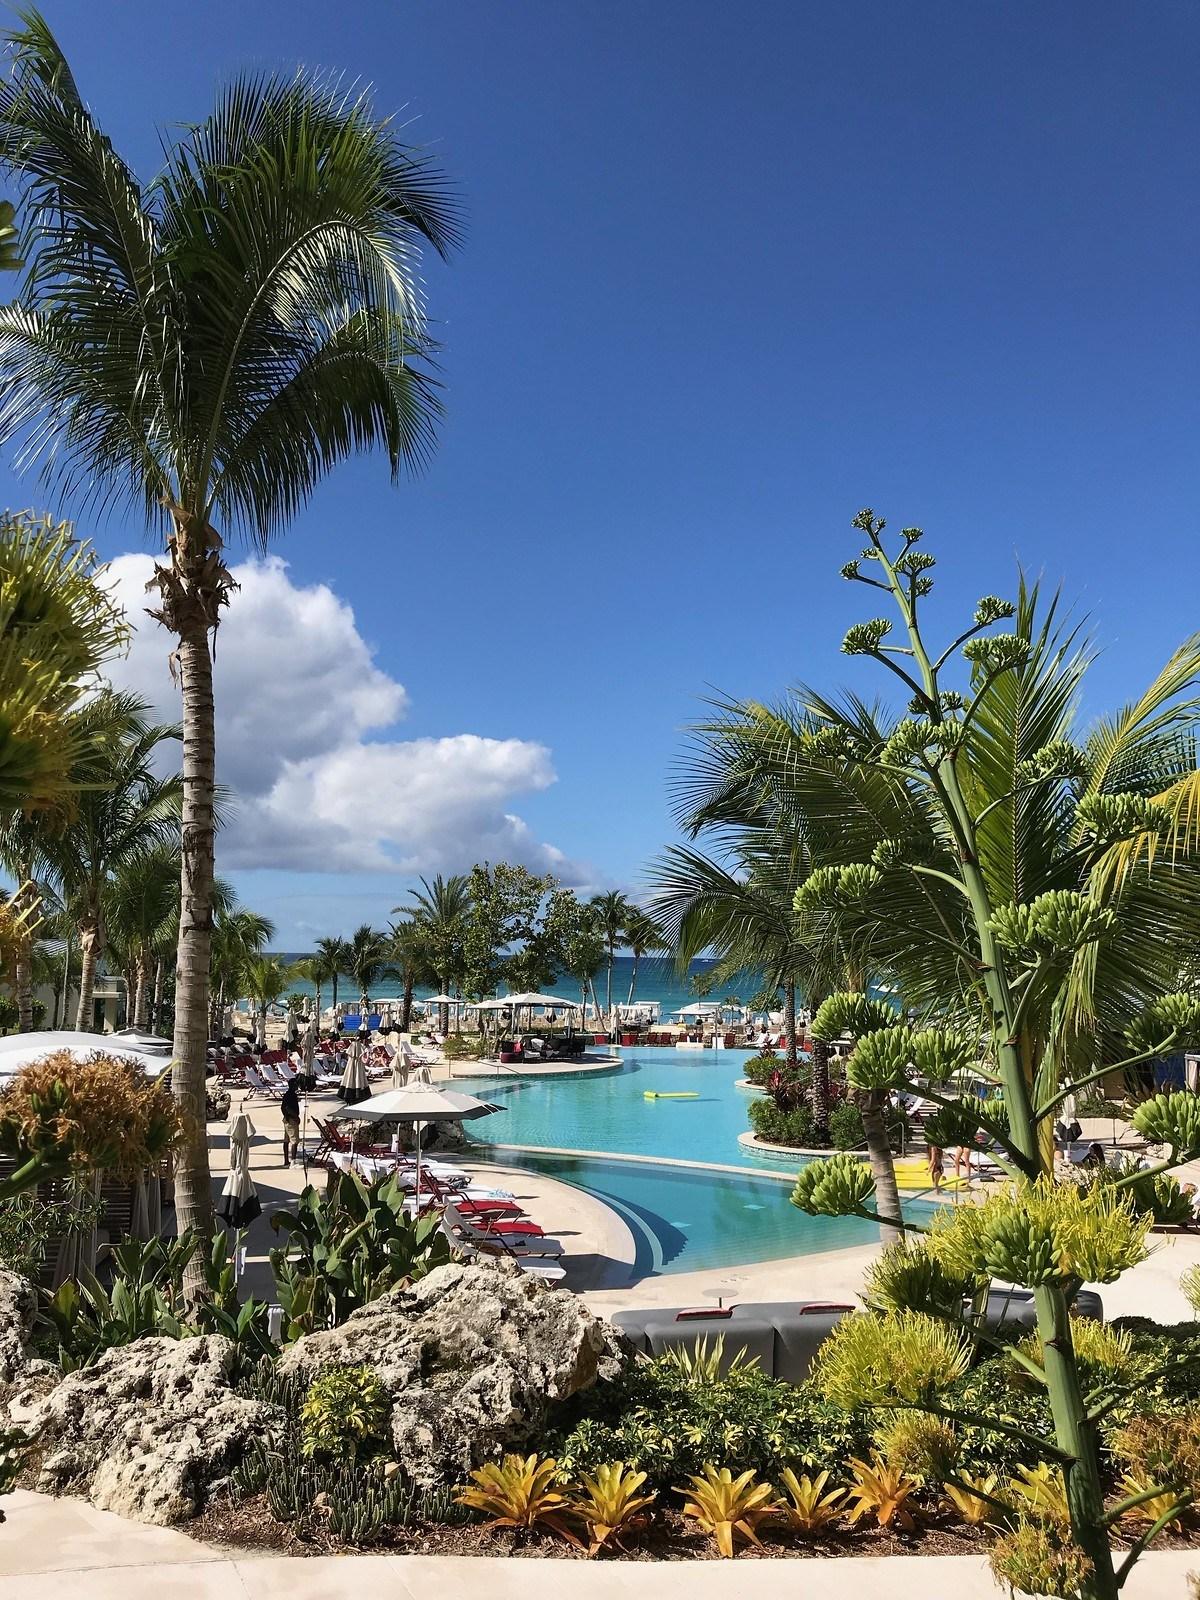 Kimpton Seafire Grand Cayman view over pools